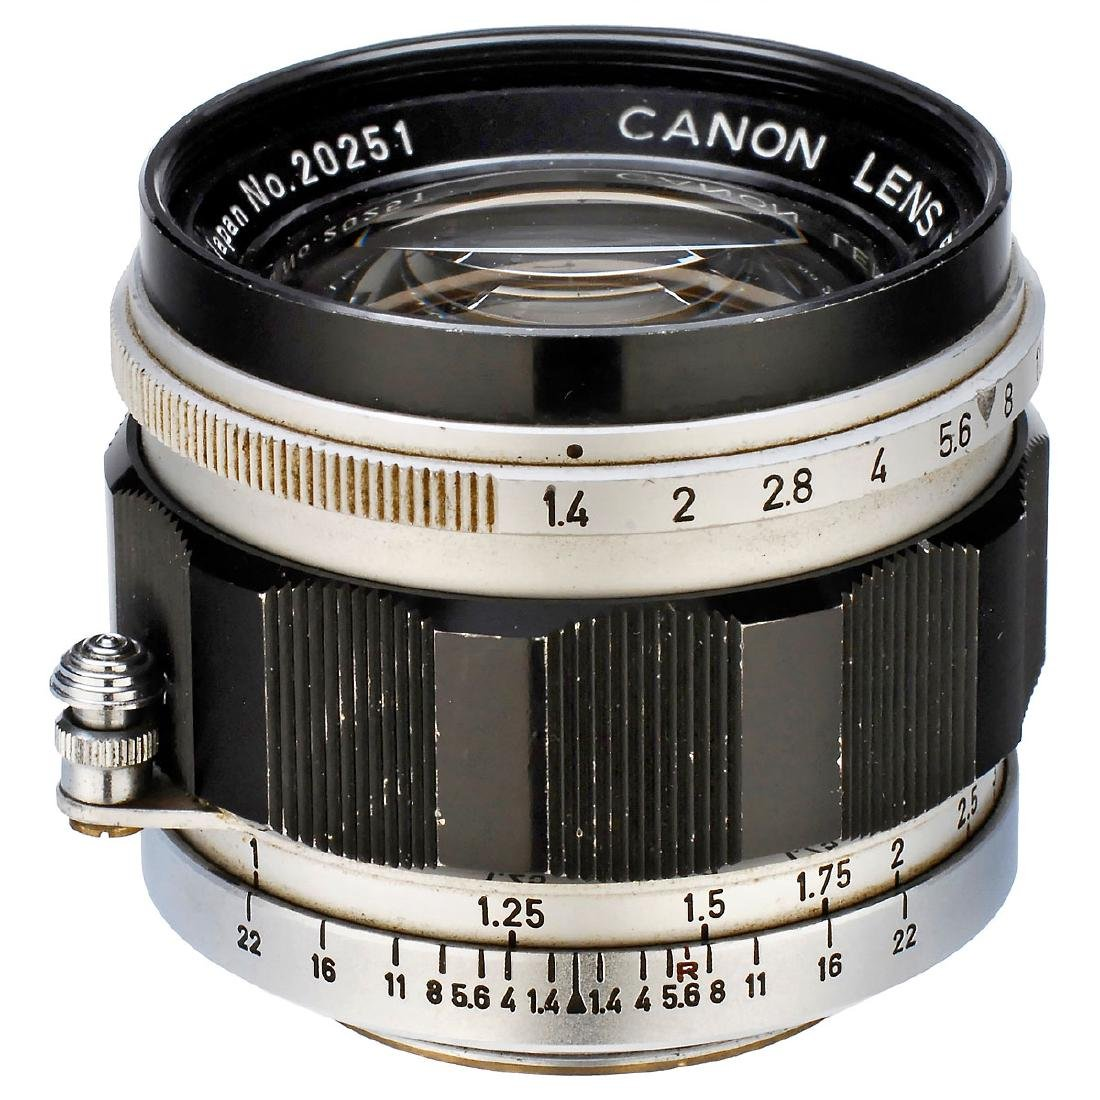 Canon Lens 1,4/50 mm (M39), 1960